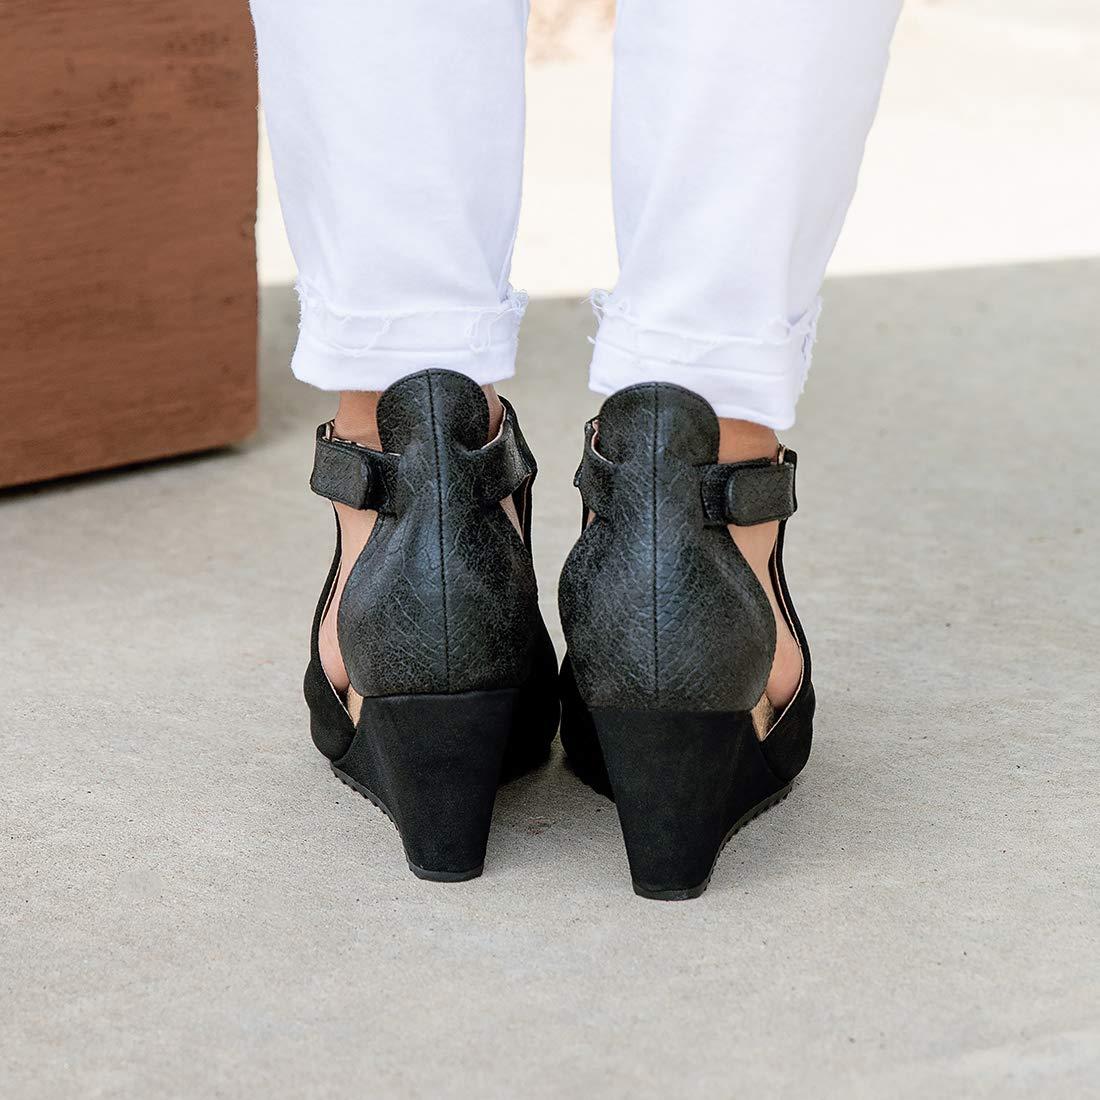 Amazon.com: Mafulus - Botas de tobillo con cuña recortada ...